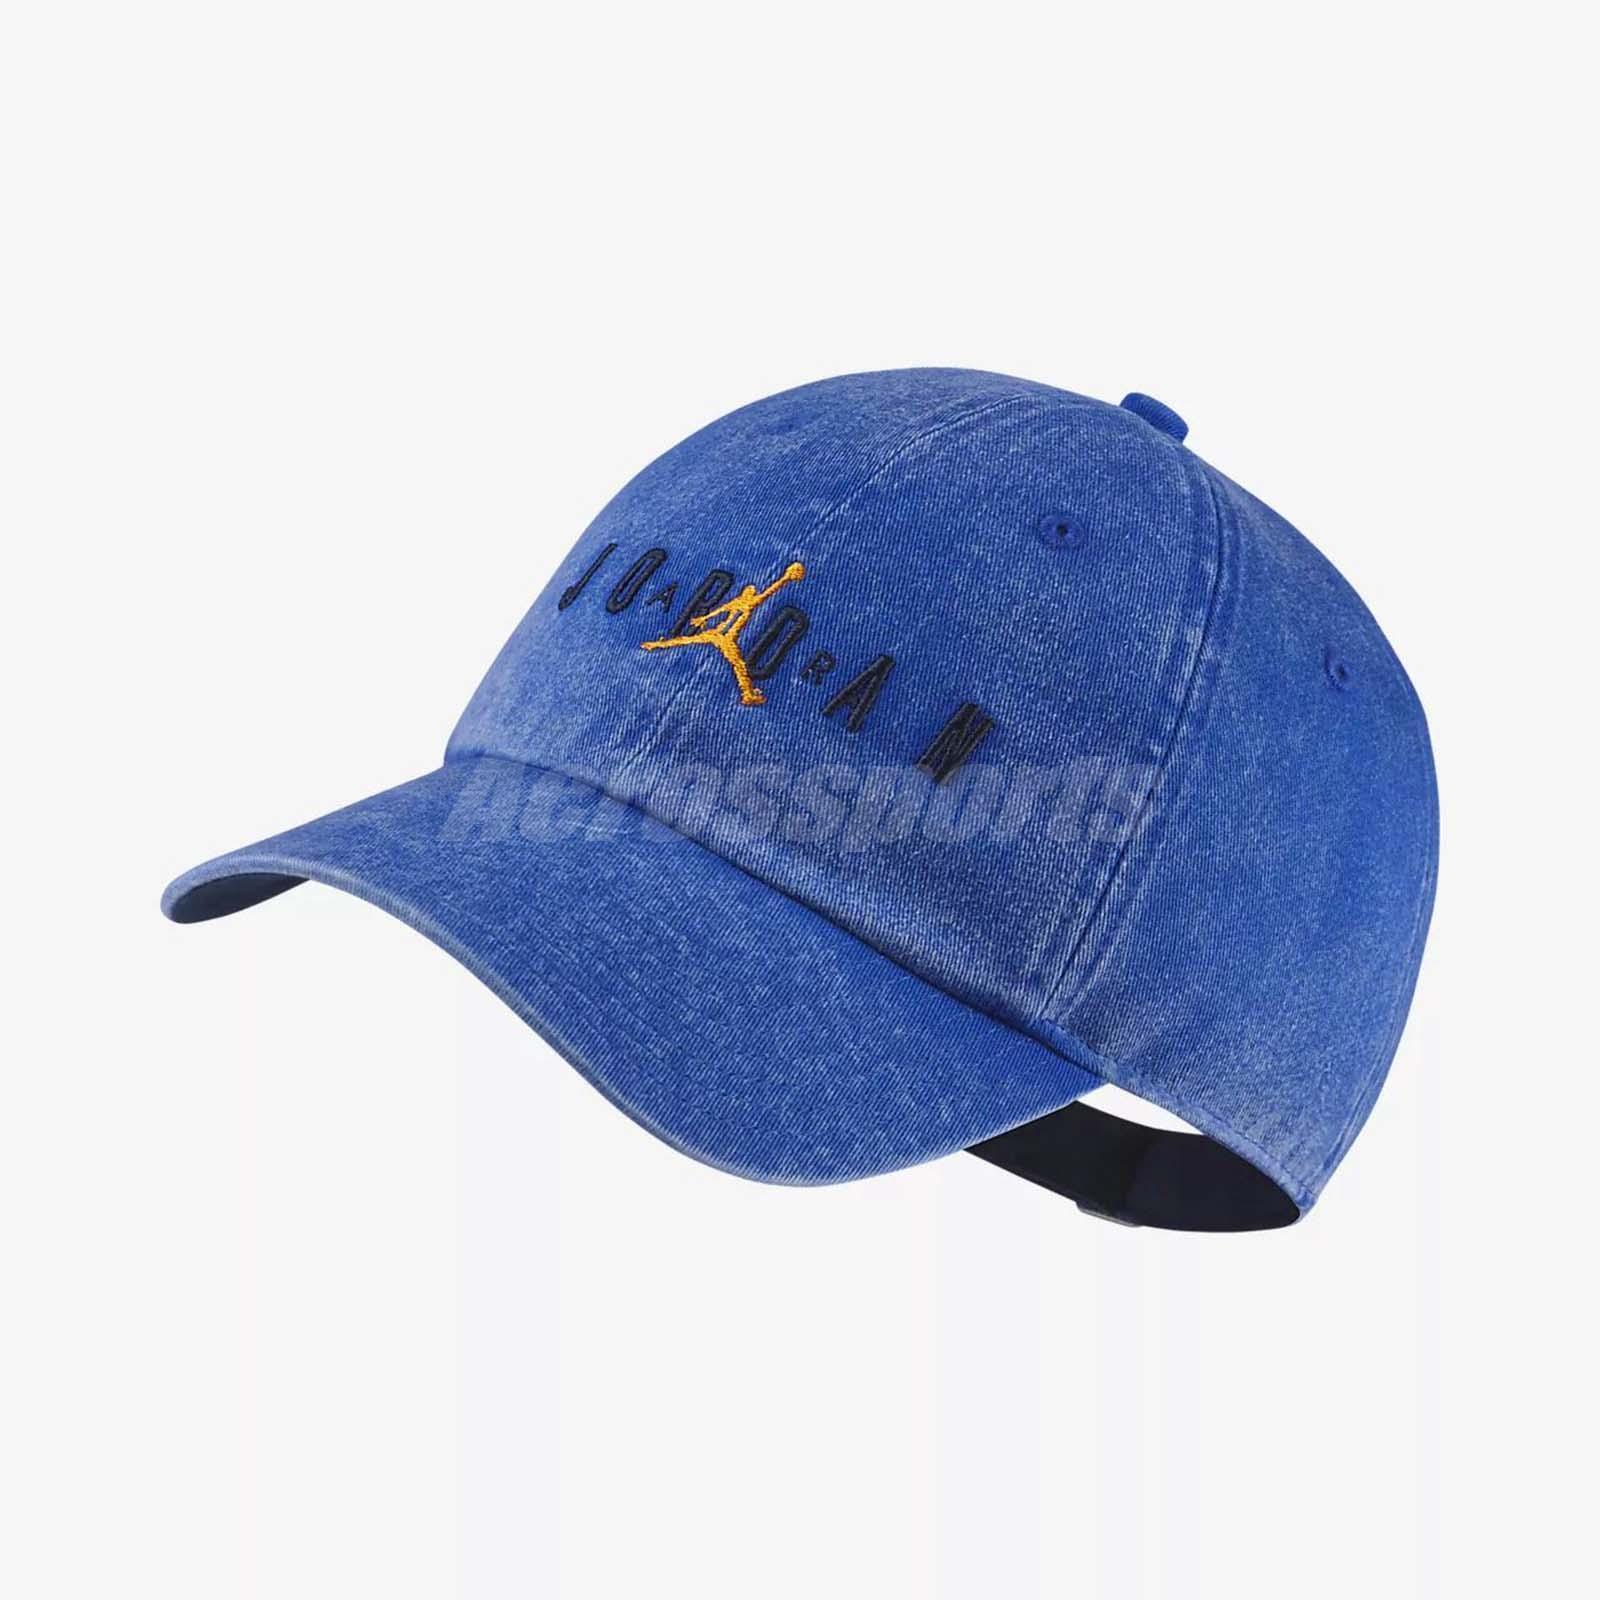 c0202f6dfc0 ... order nike jordan air heritage jumpman adjustable cap air jordan hat  h86 washed blue aa1306 405 ...